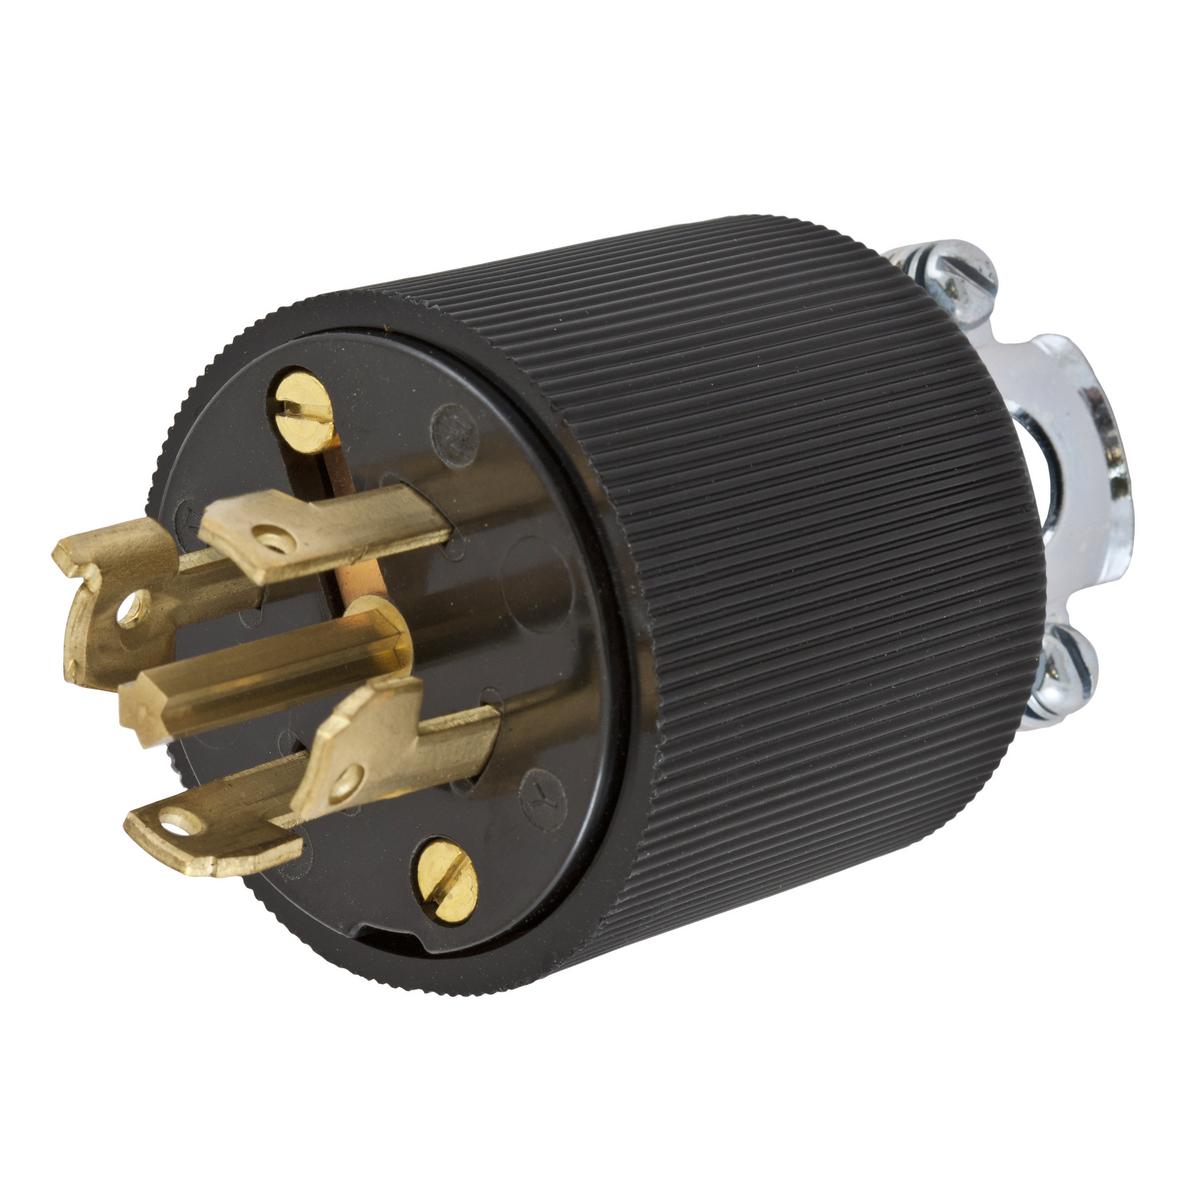 Hubbell HBL45315 30 Amp 600 Volt 4-Pole 5-Wire Black Locking Plug